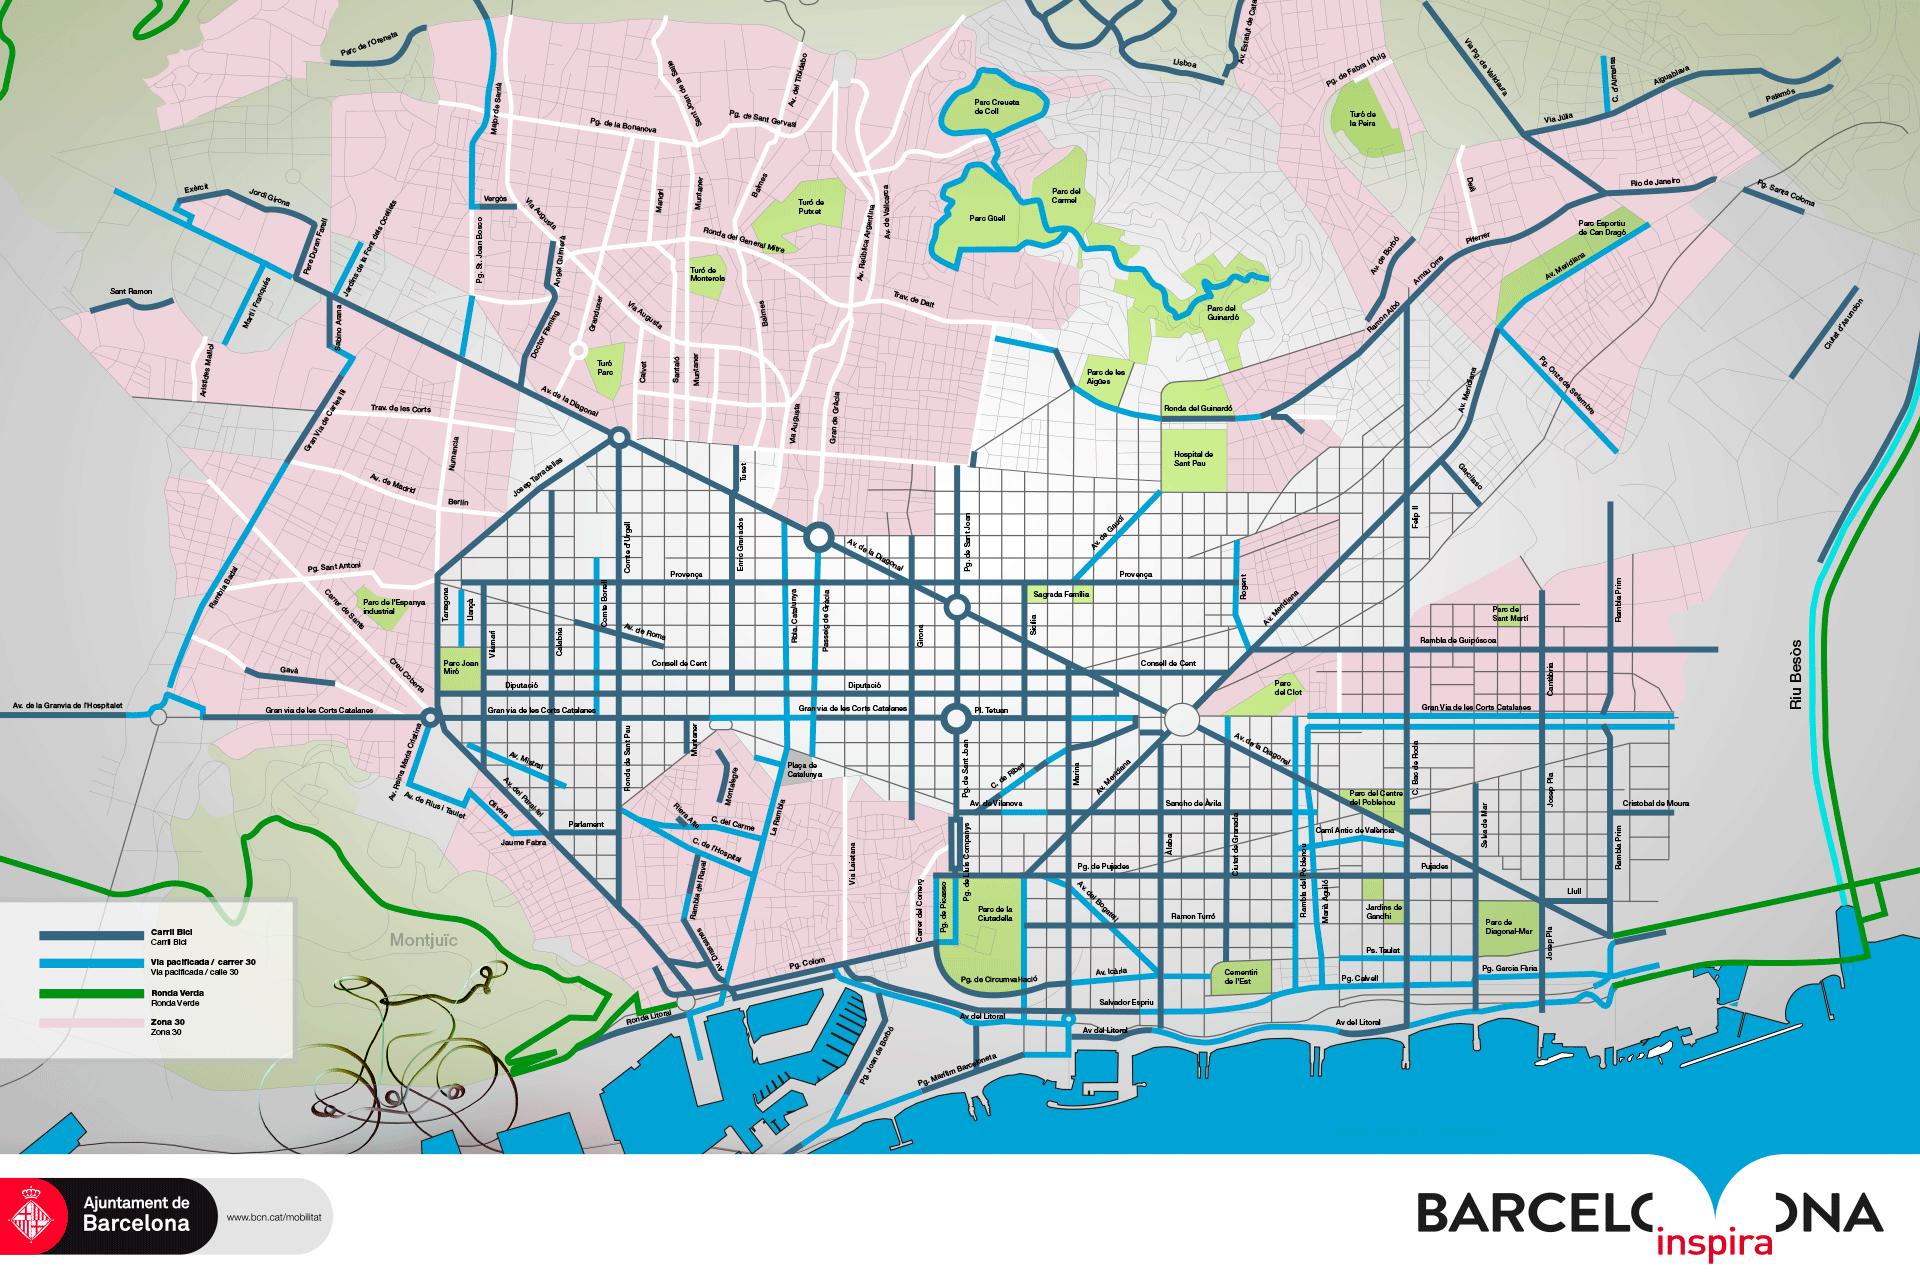 Plano_EnBici_Per_Barcelona_AjuntamentBarcelona